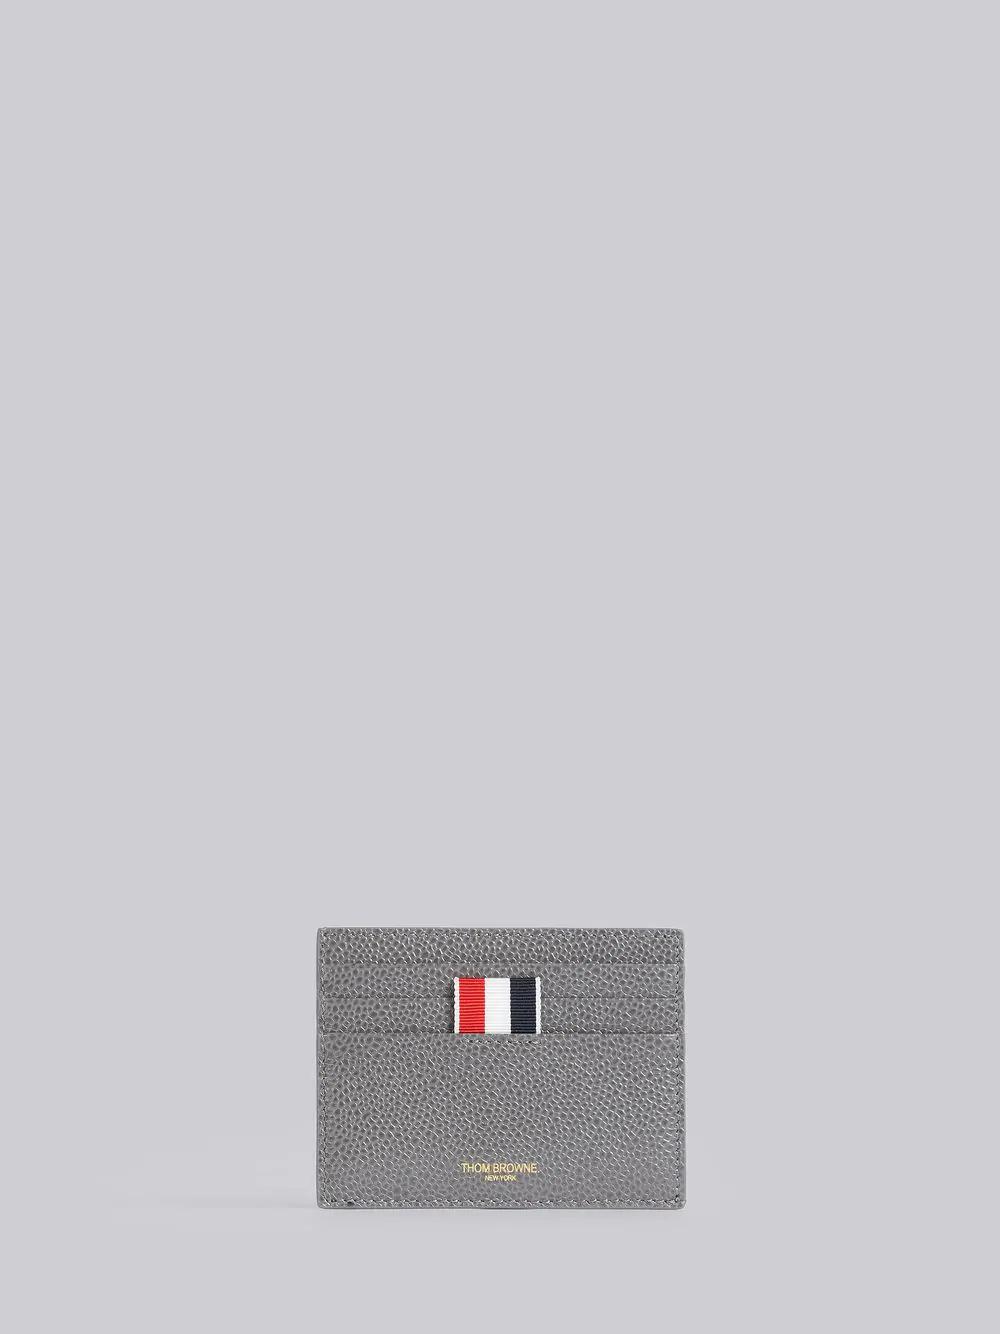 Thom Browne Bicolor Note Cardholder In Grey